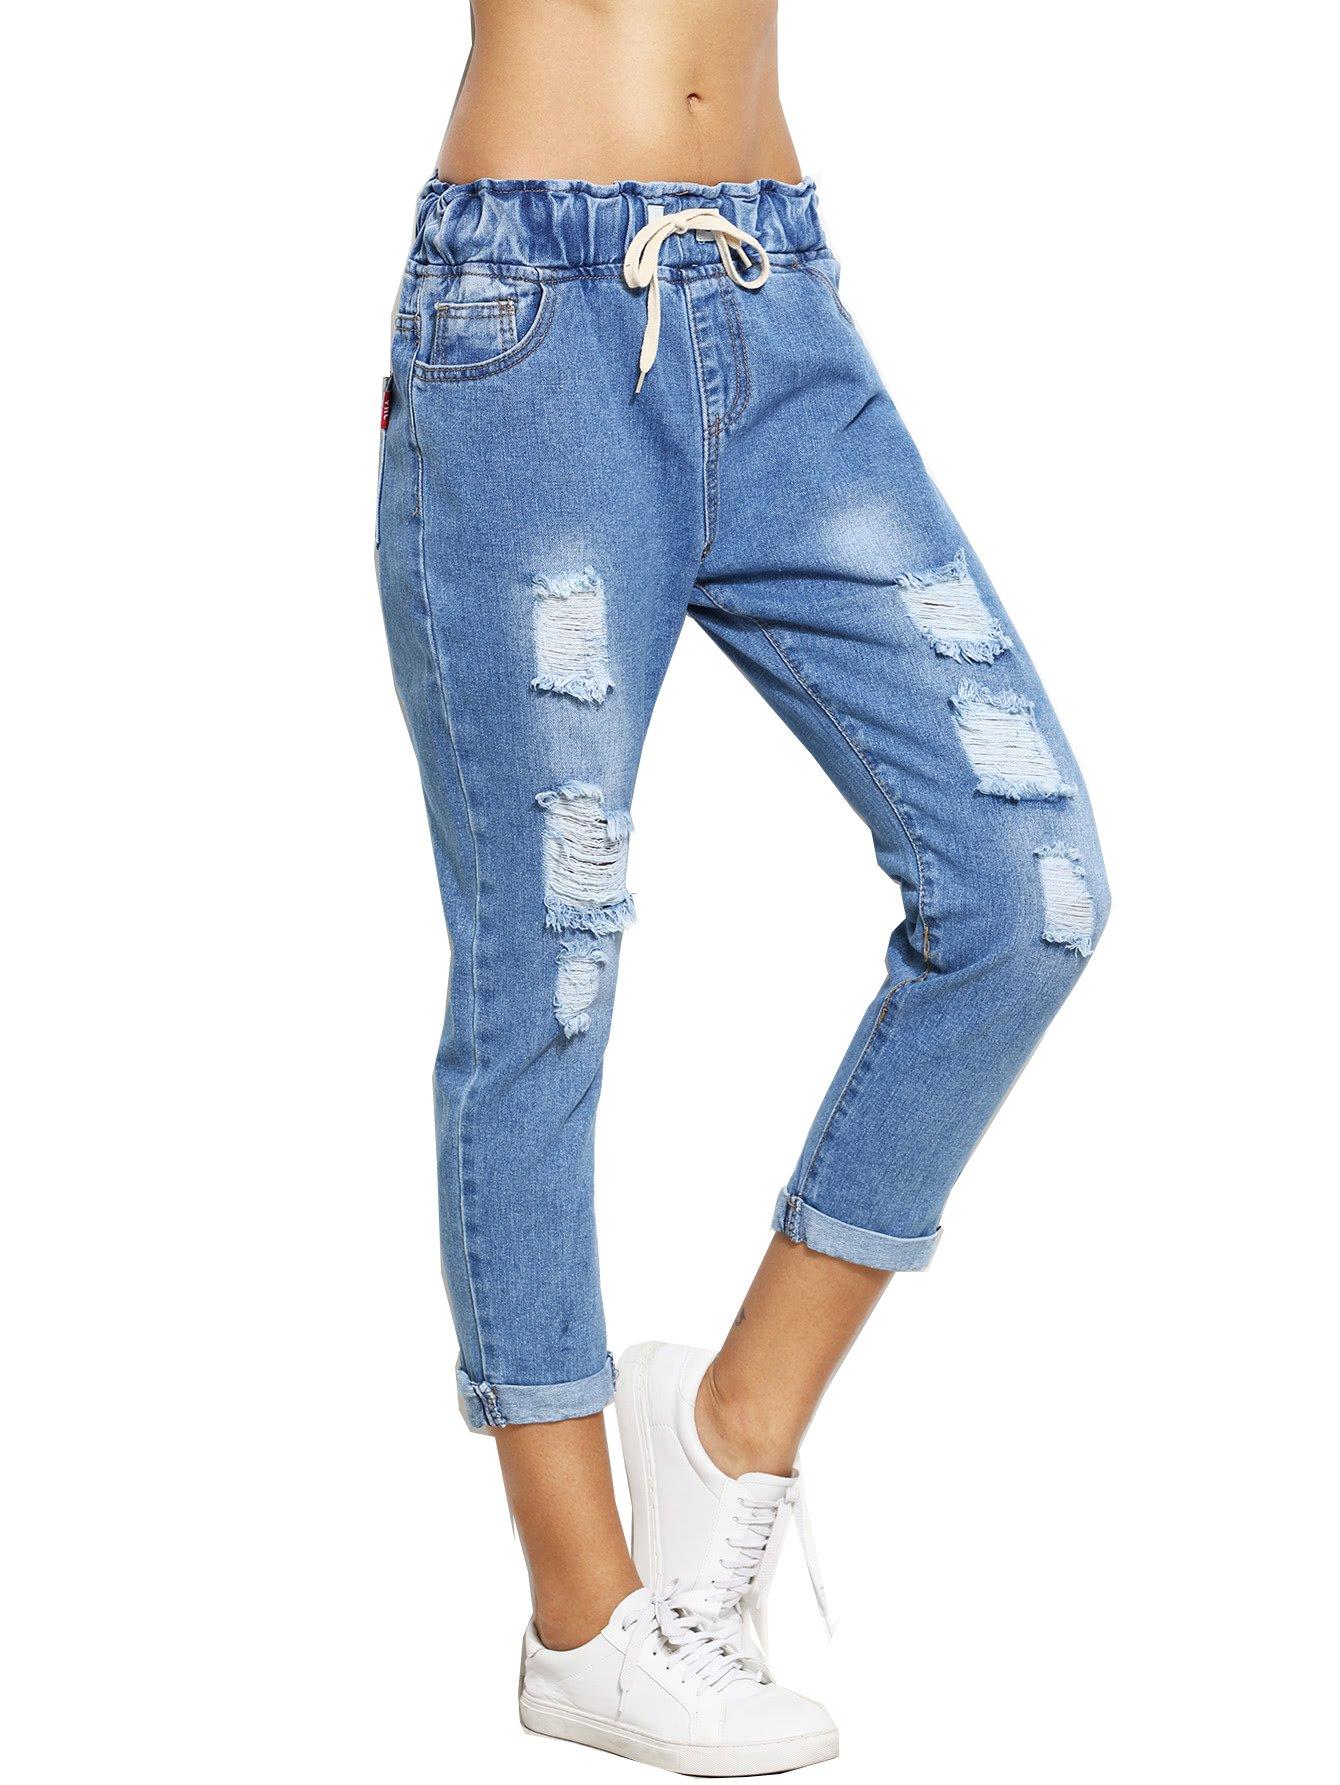 SweatyRocks Women's Juniors Distressed Ripped Drawstring High Waist Capris Crop Jeans (X-Large, Blue#3)